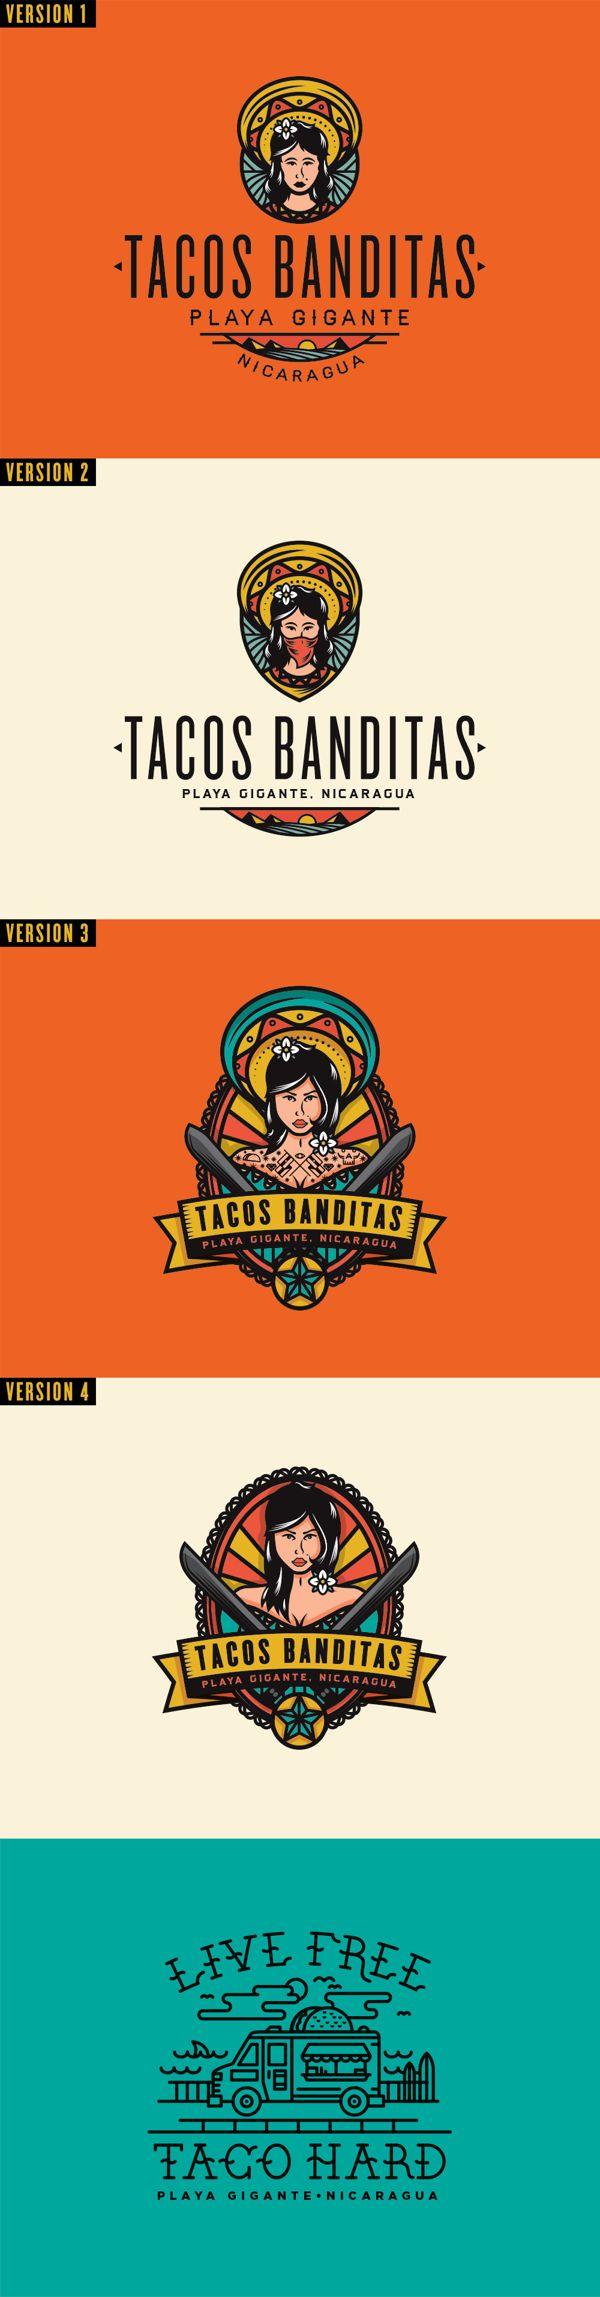 Tacos Banditas by Adam Grason, via Behance